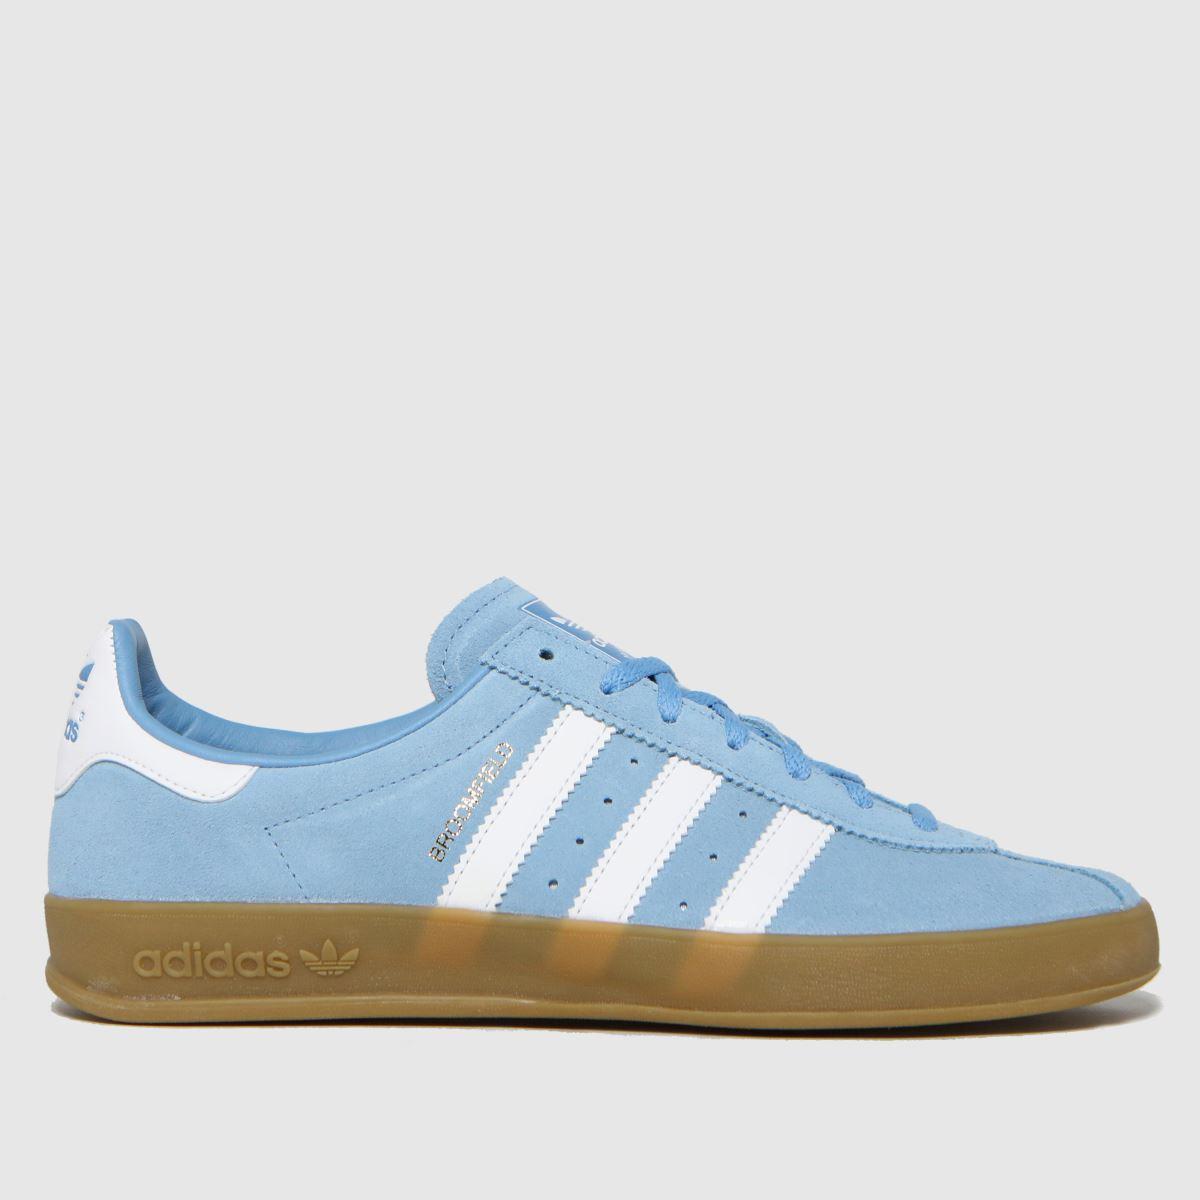 Adidas Pale Blue Broomfield Trainers